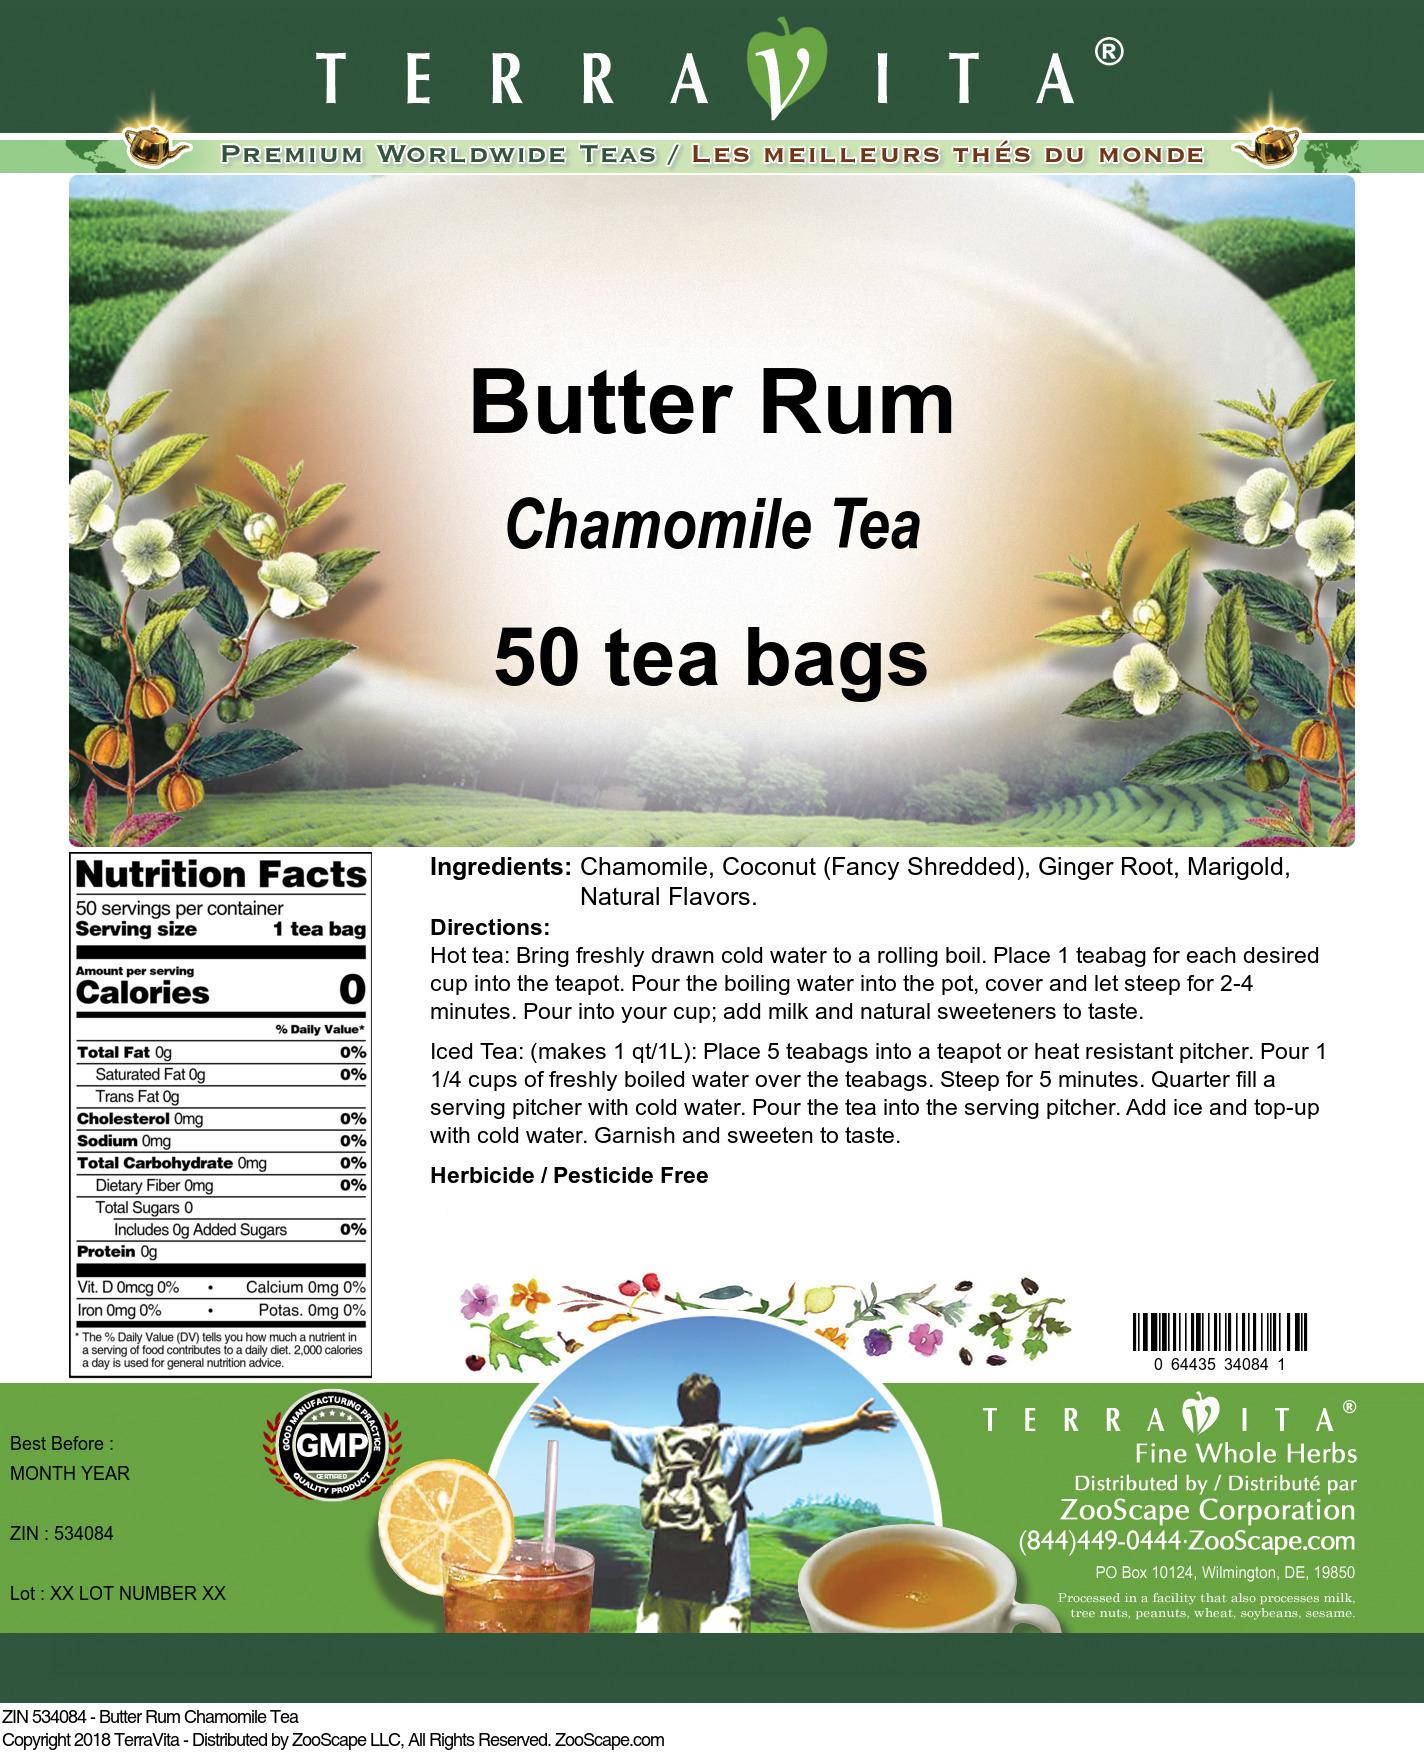 Butter Rum Chamomile Tea